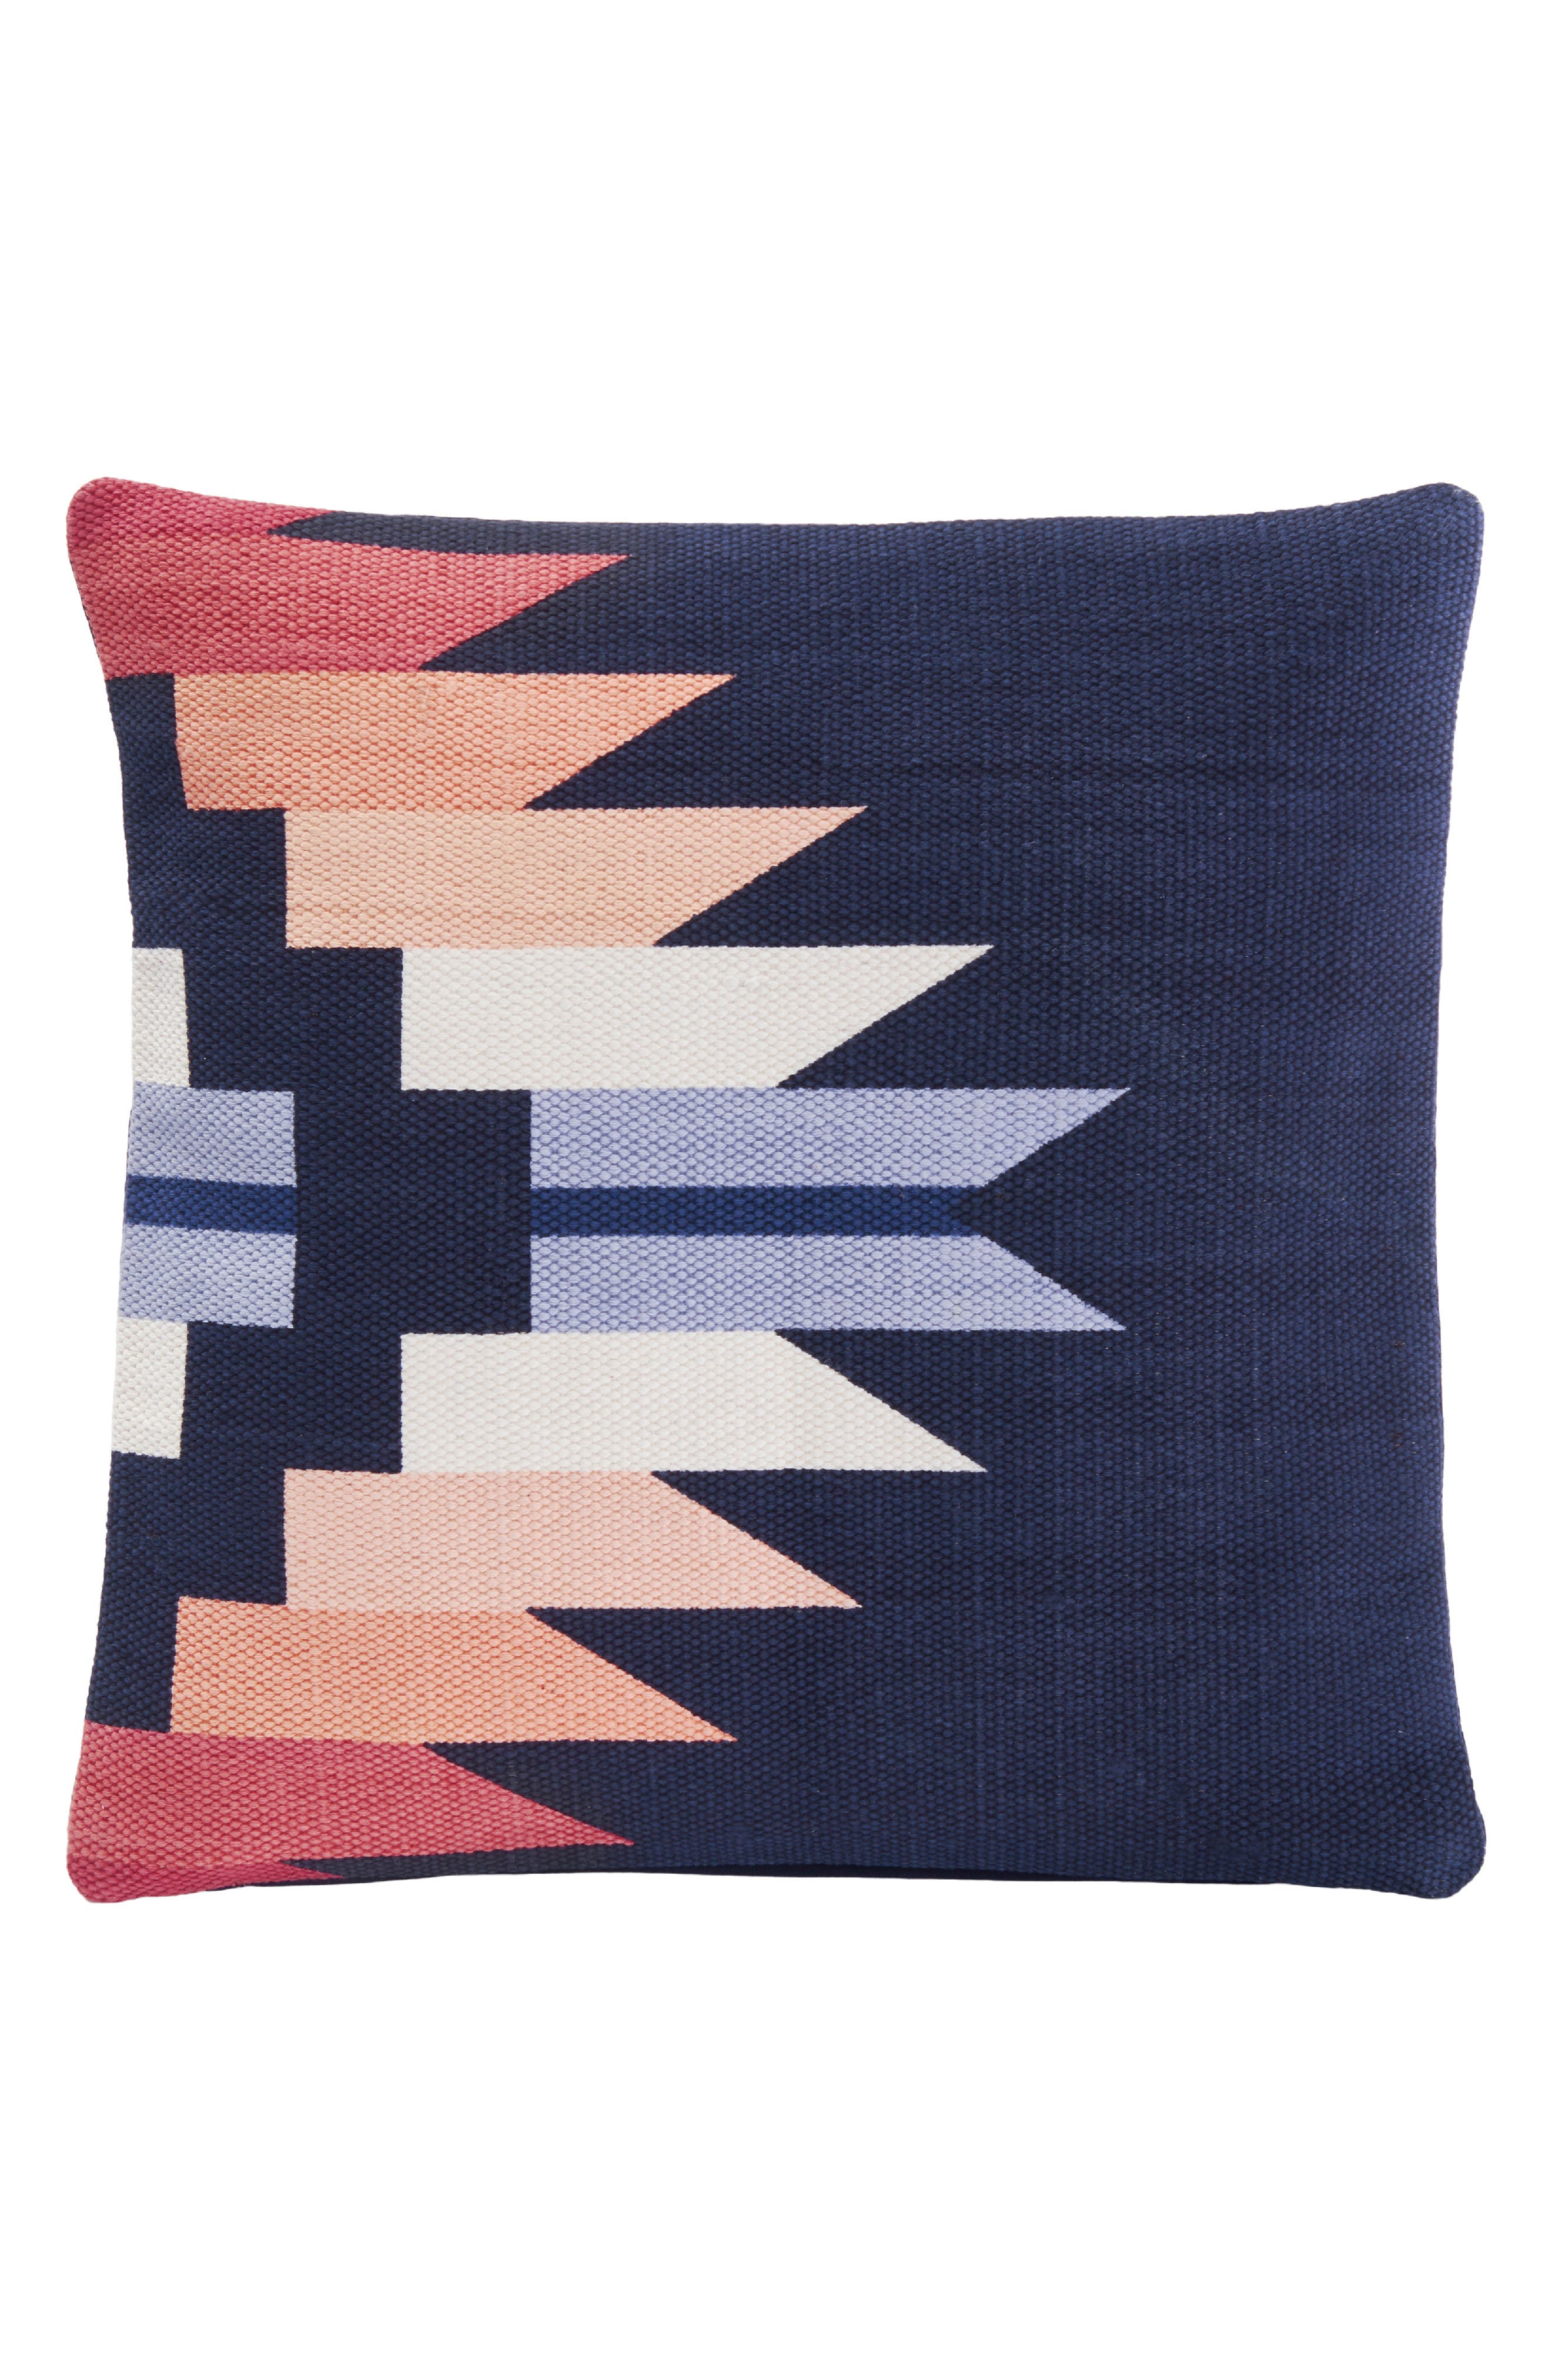 PENDLETON Sequoia Sunset Accent Pillow, Main, color, NAVY